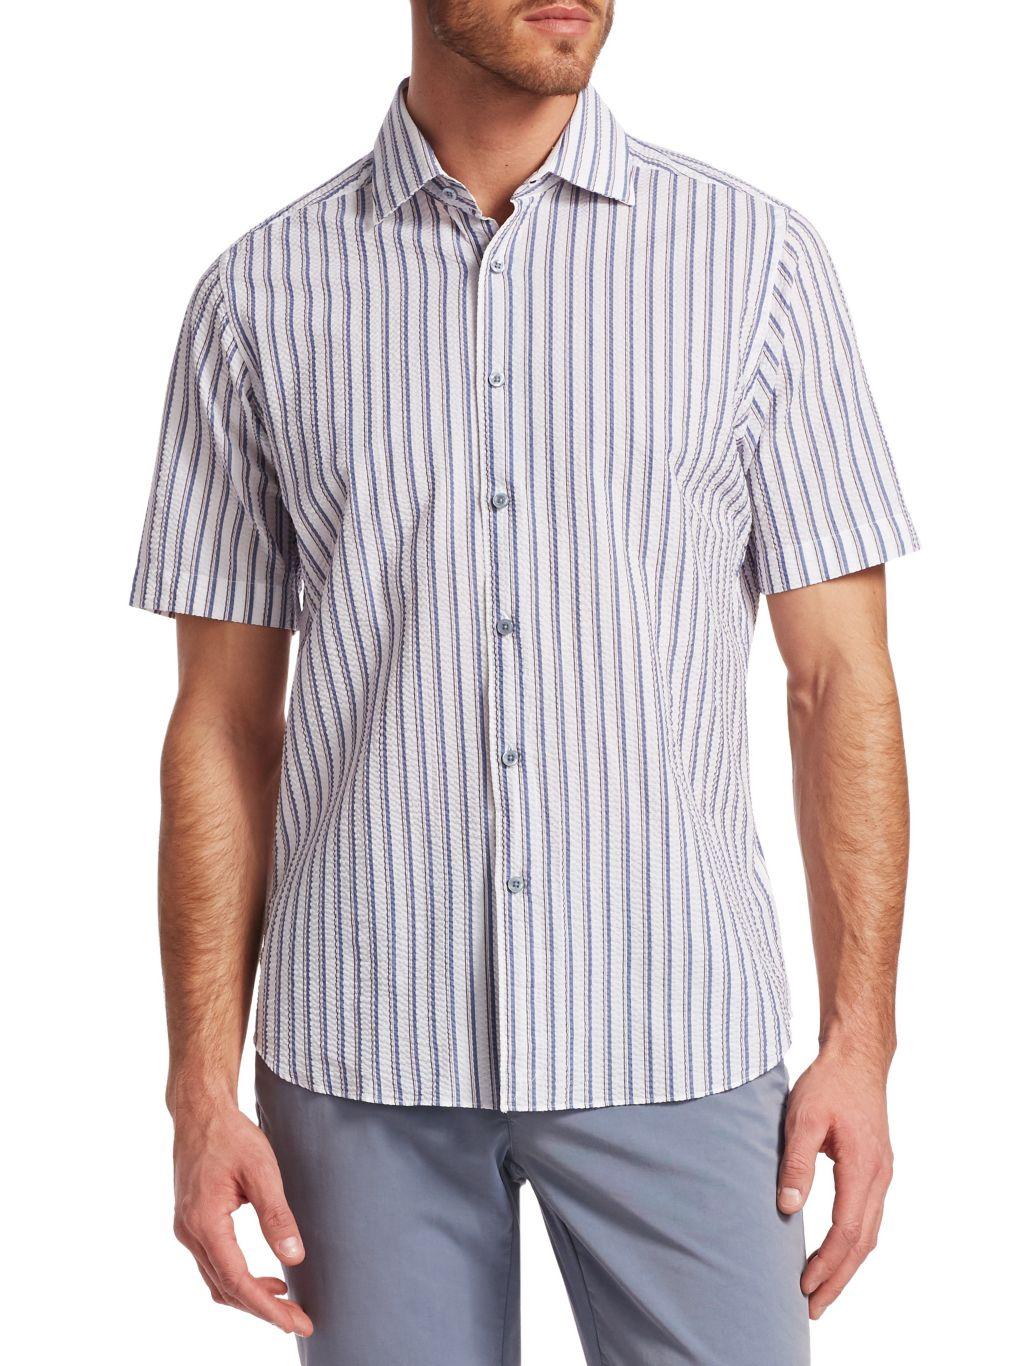 Saks Fifth Avenue COLLECTION Seersucker Stripe Woven Cotton Button-Down Shirt